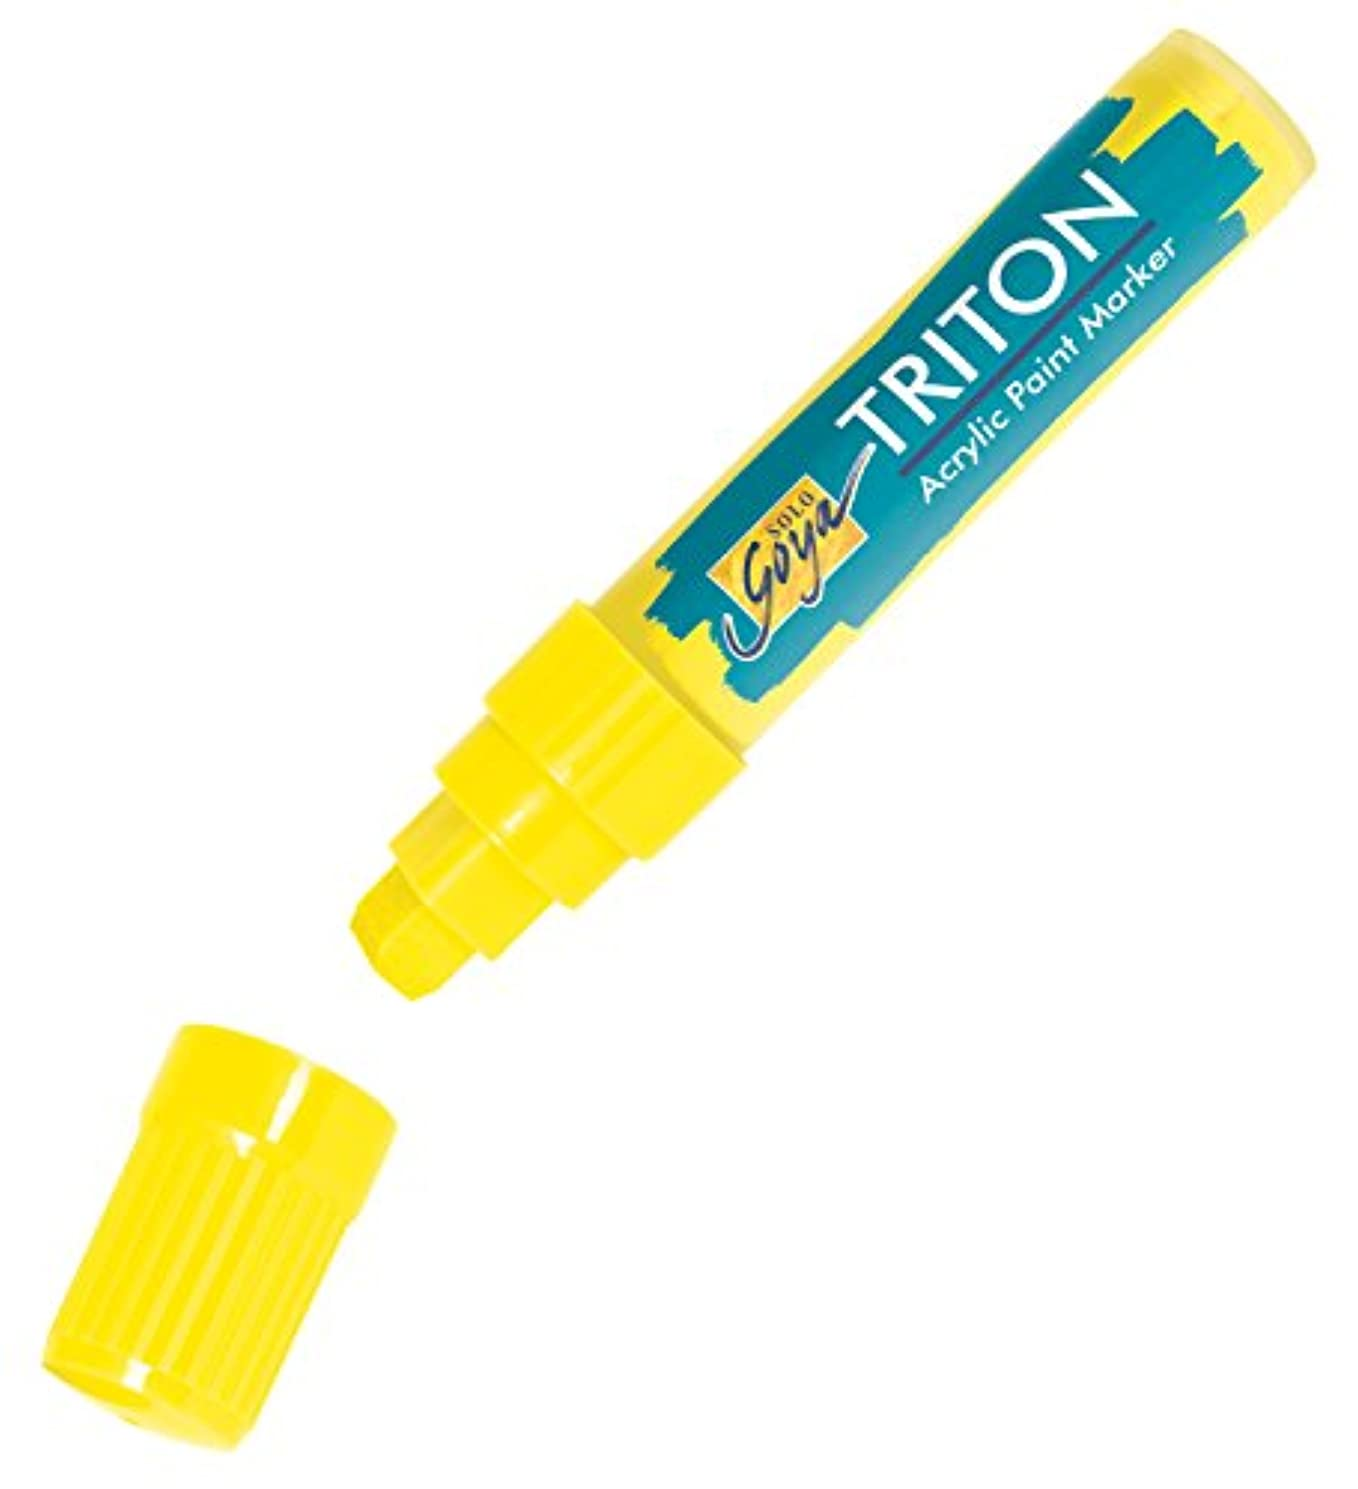 Kreul 17926?(Solo Goya Triton Chisel Tip Acrylic Paint Marker 15?mm) Lemon Yellow